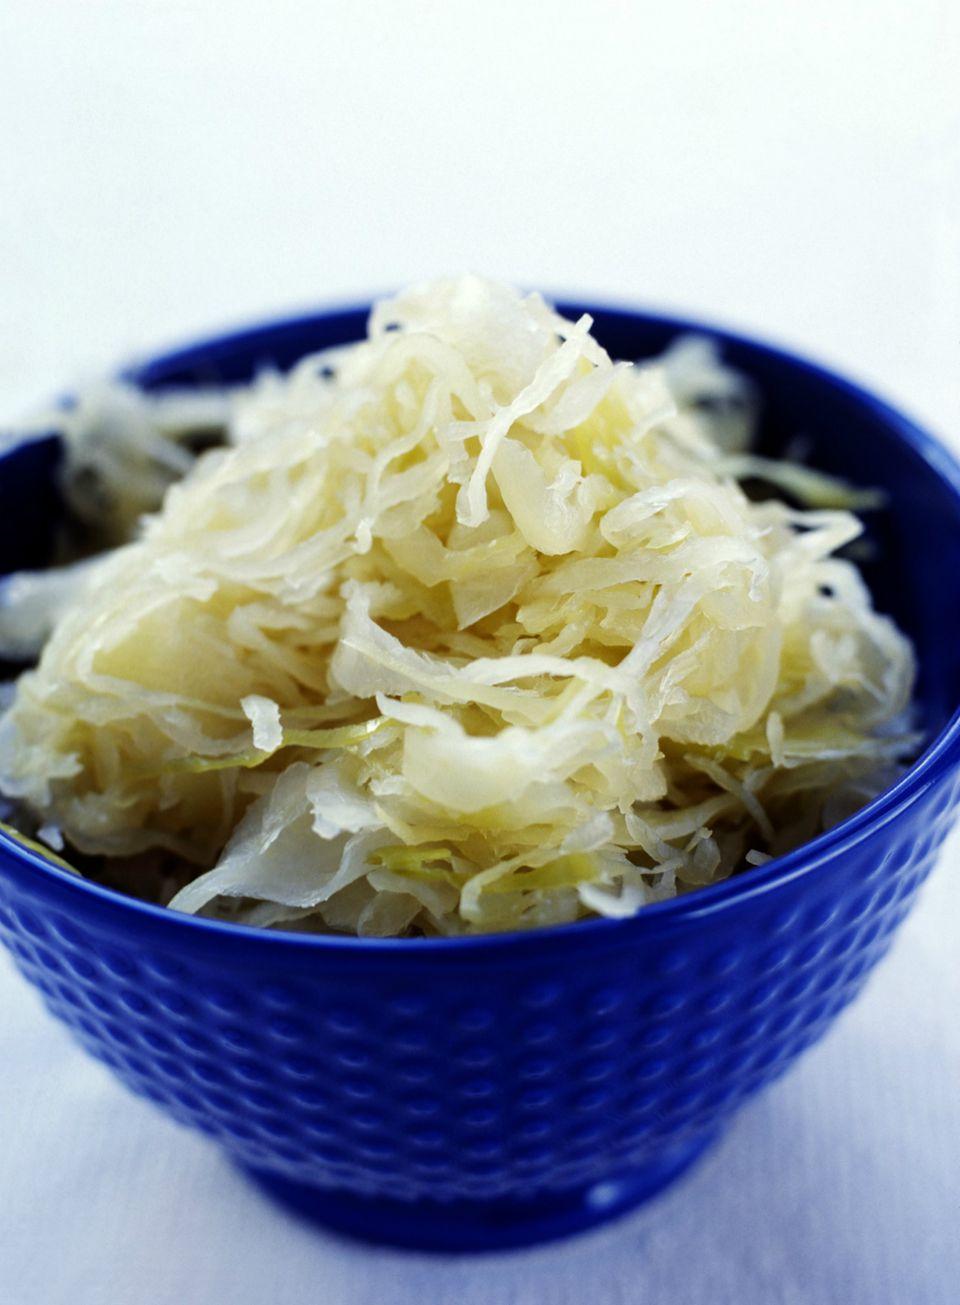 Traditional German sauerkraut